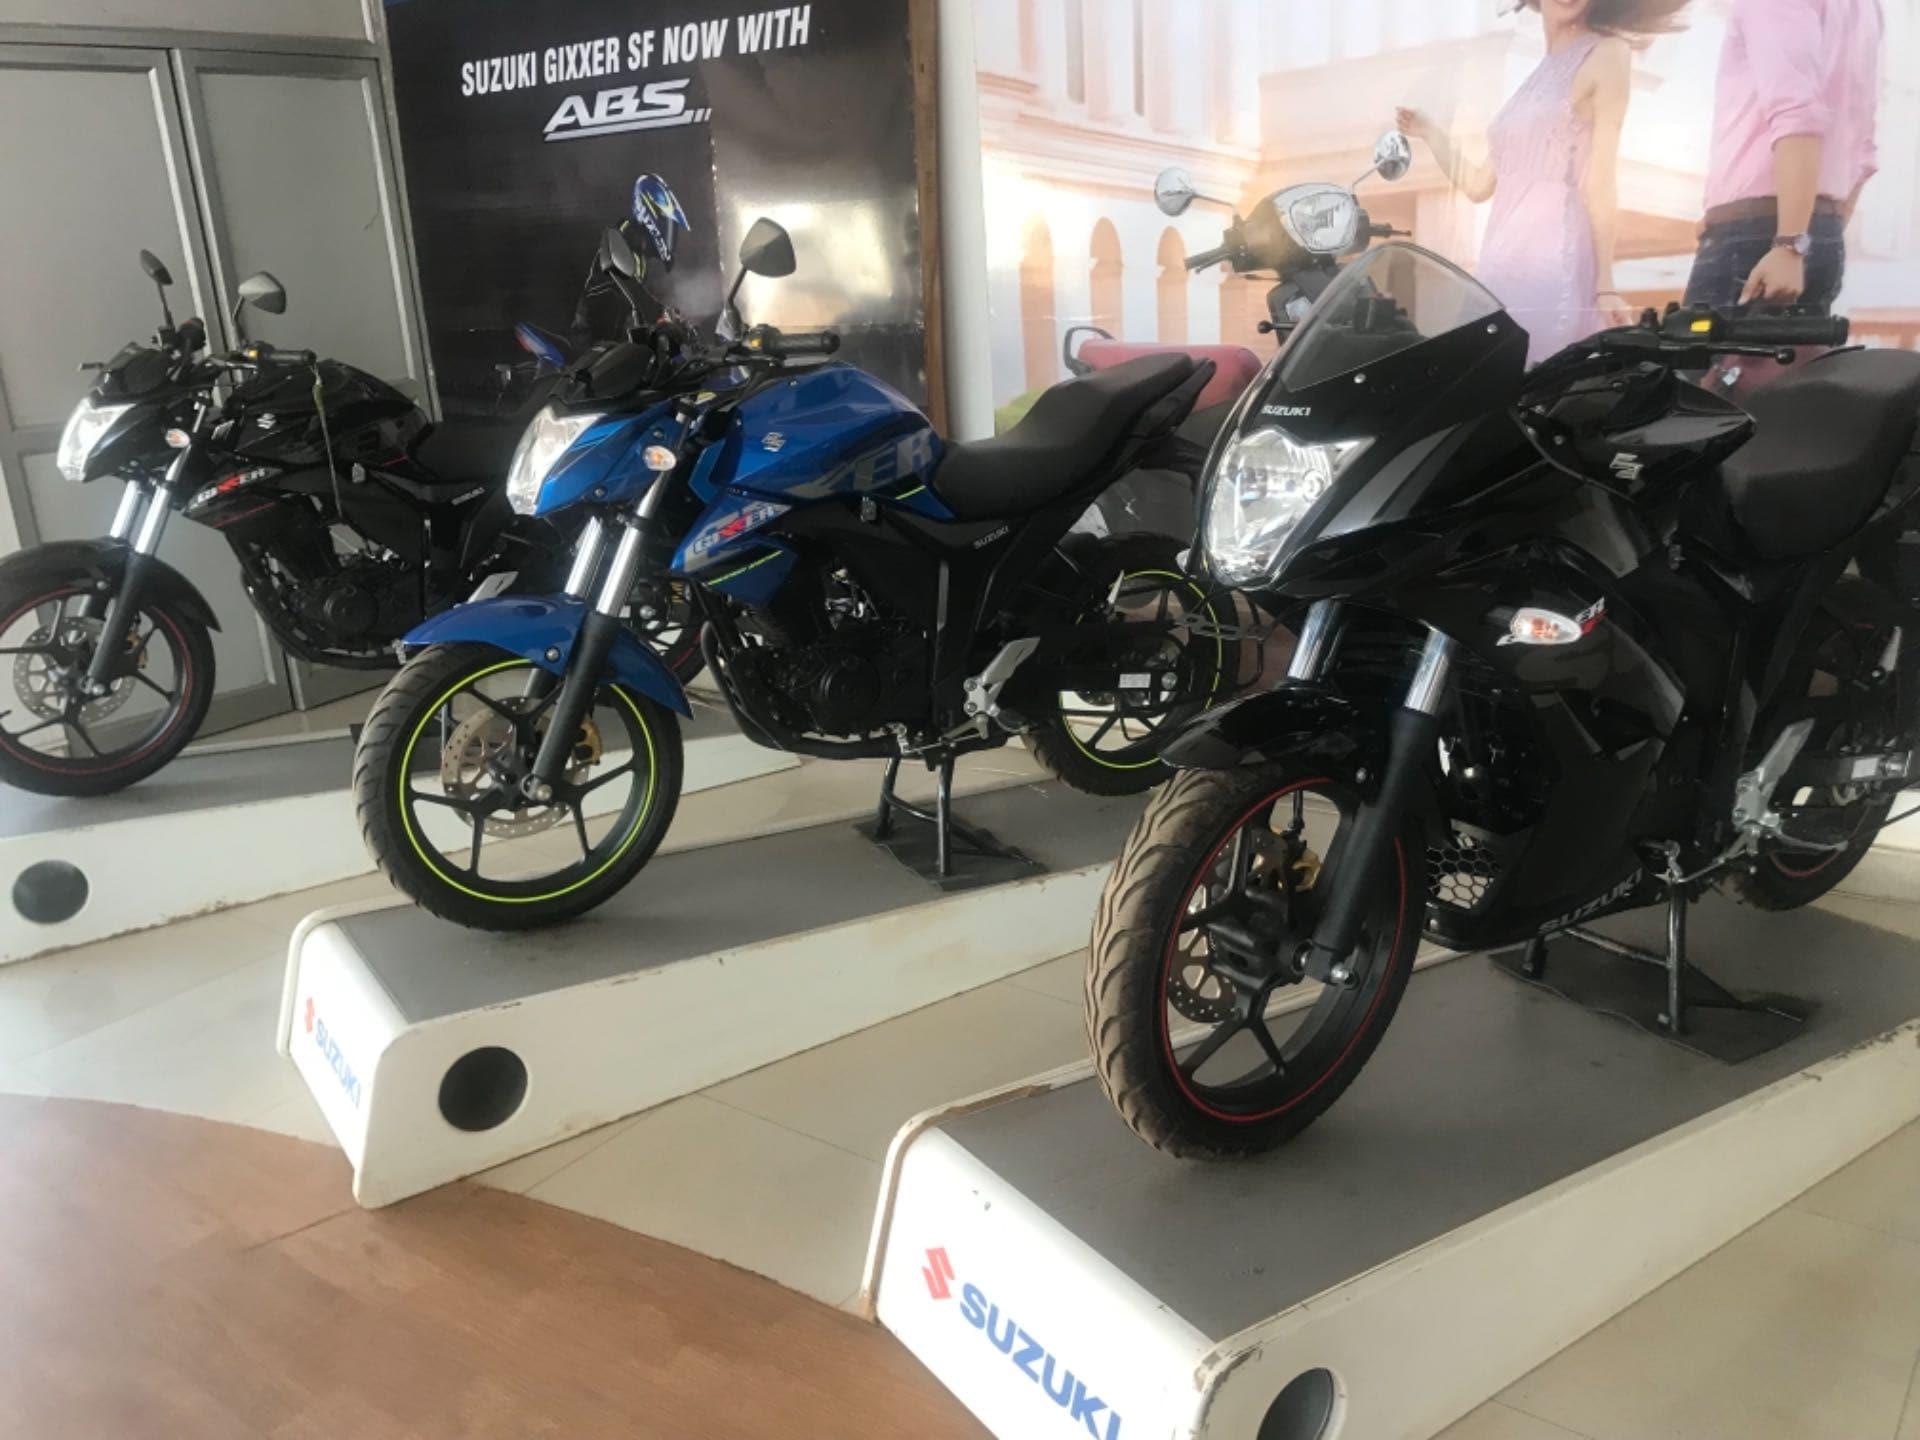 Top Suzuki Bike Dealers in Hubli - Best Suzuki Motorcycle Dealers